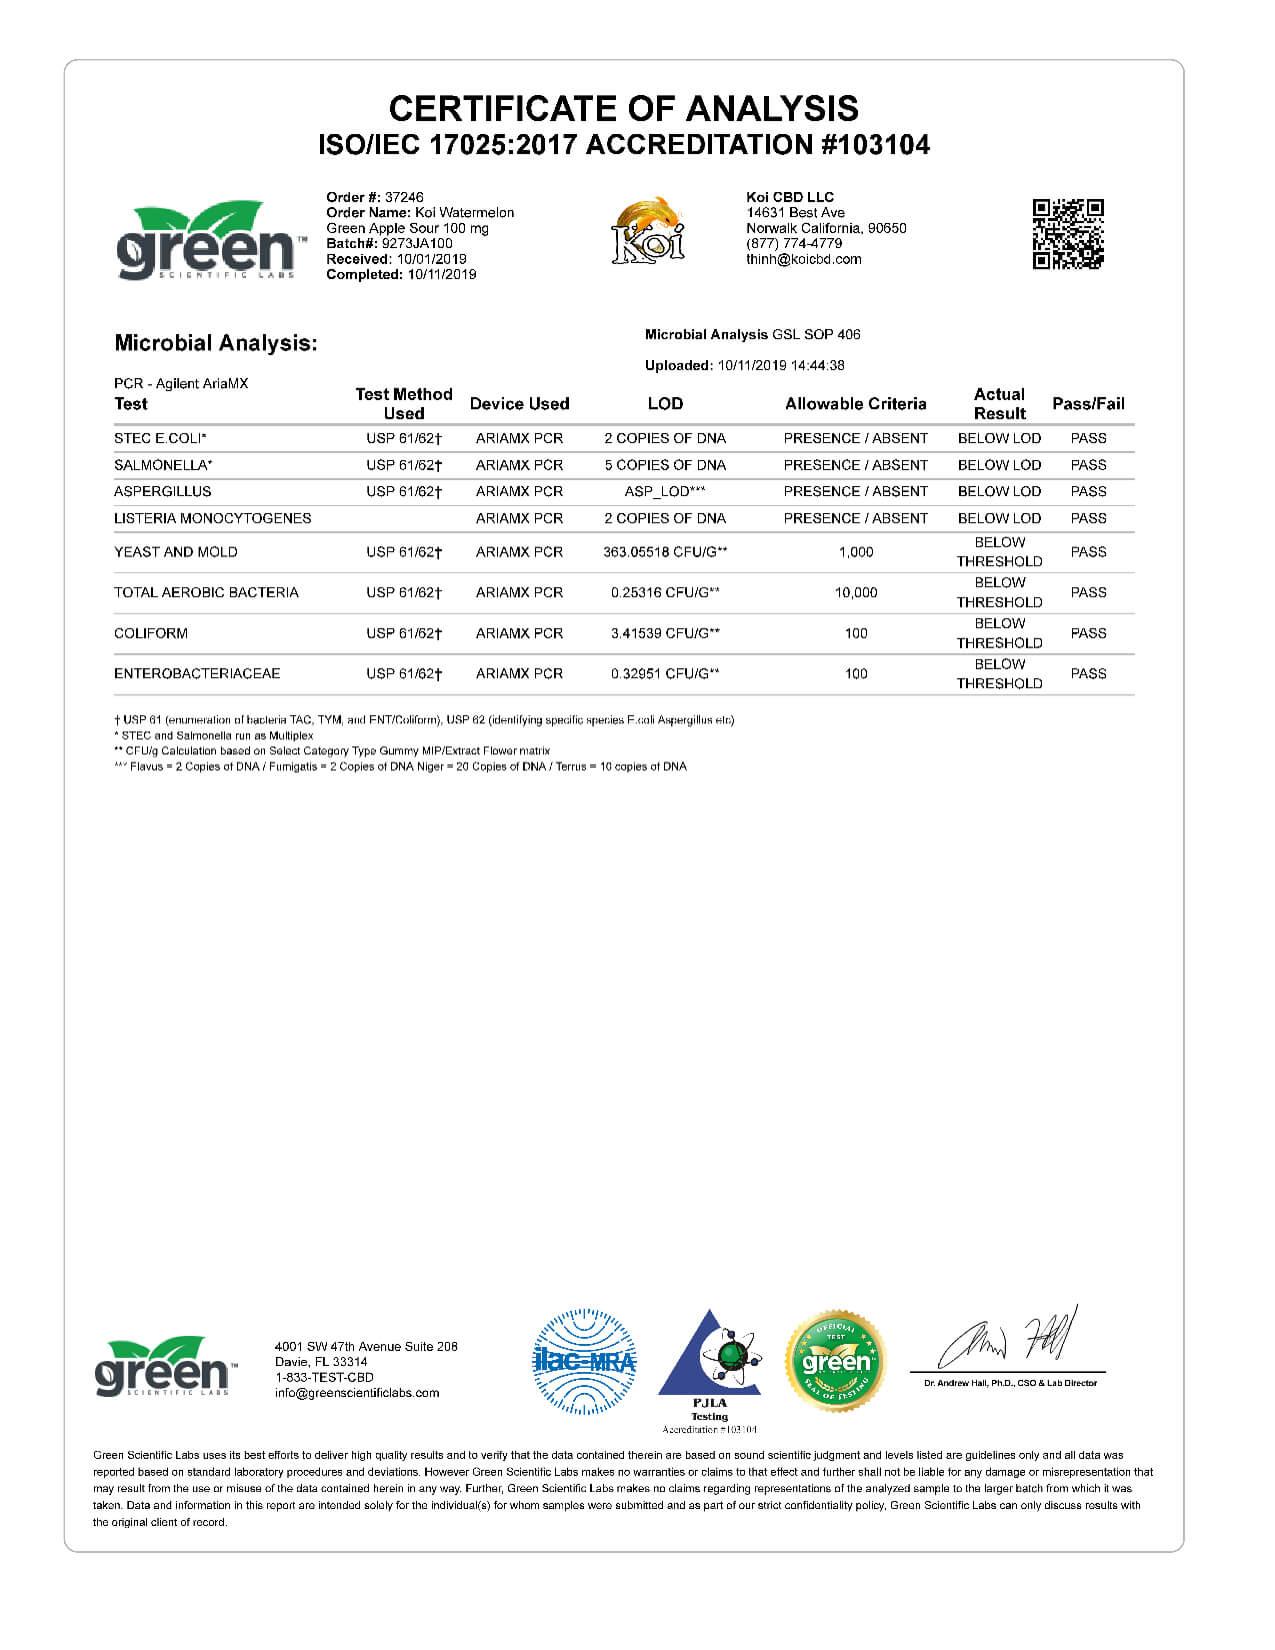 Koi CBD Watermelon Green Apple Sour Vape Oil 100mg page5